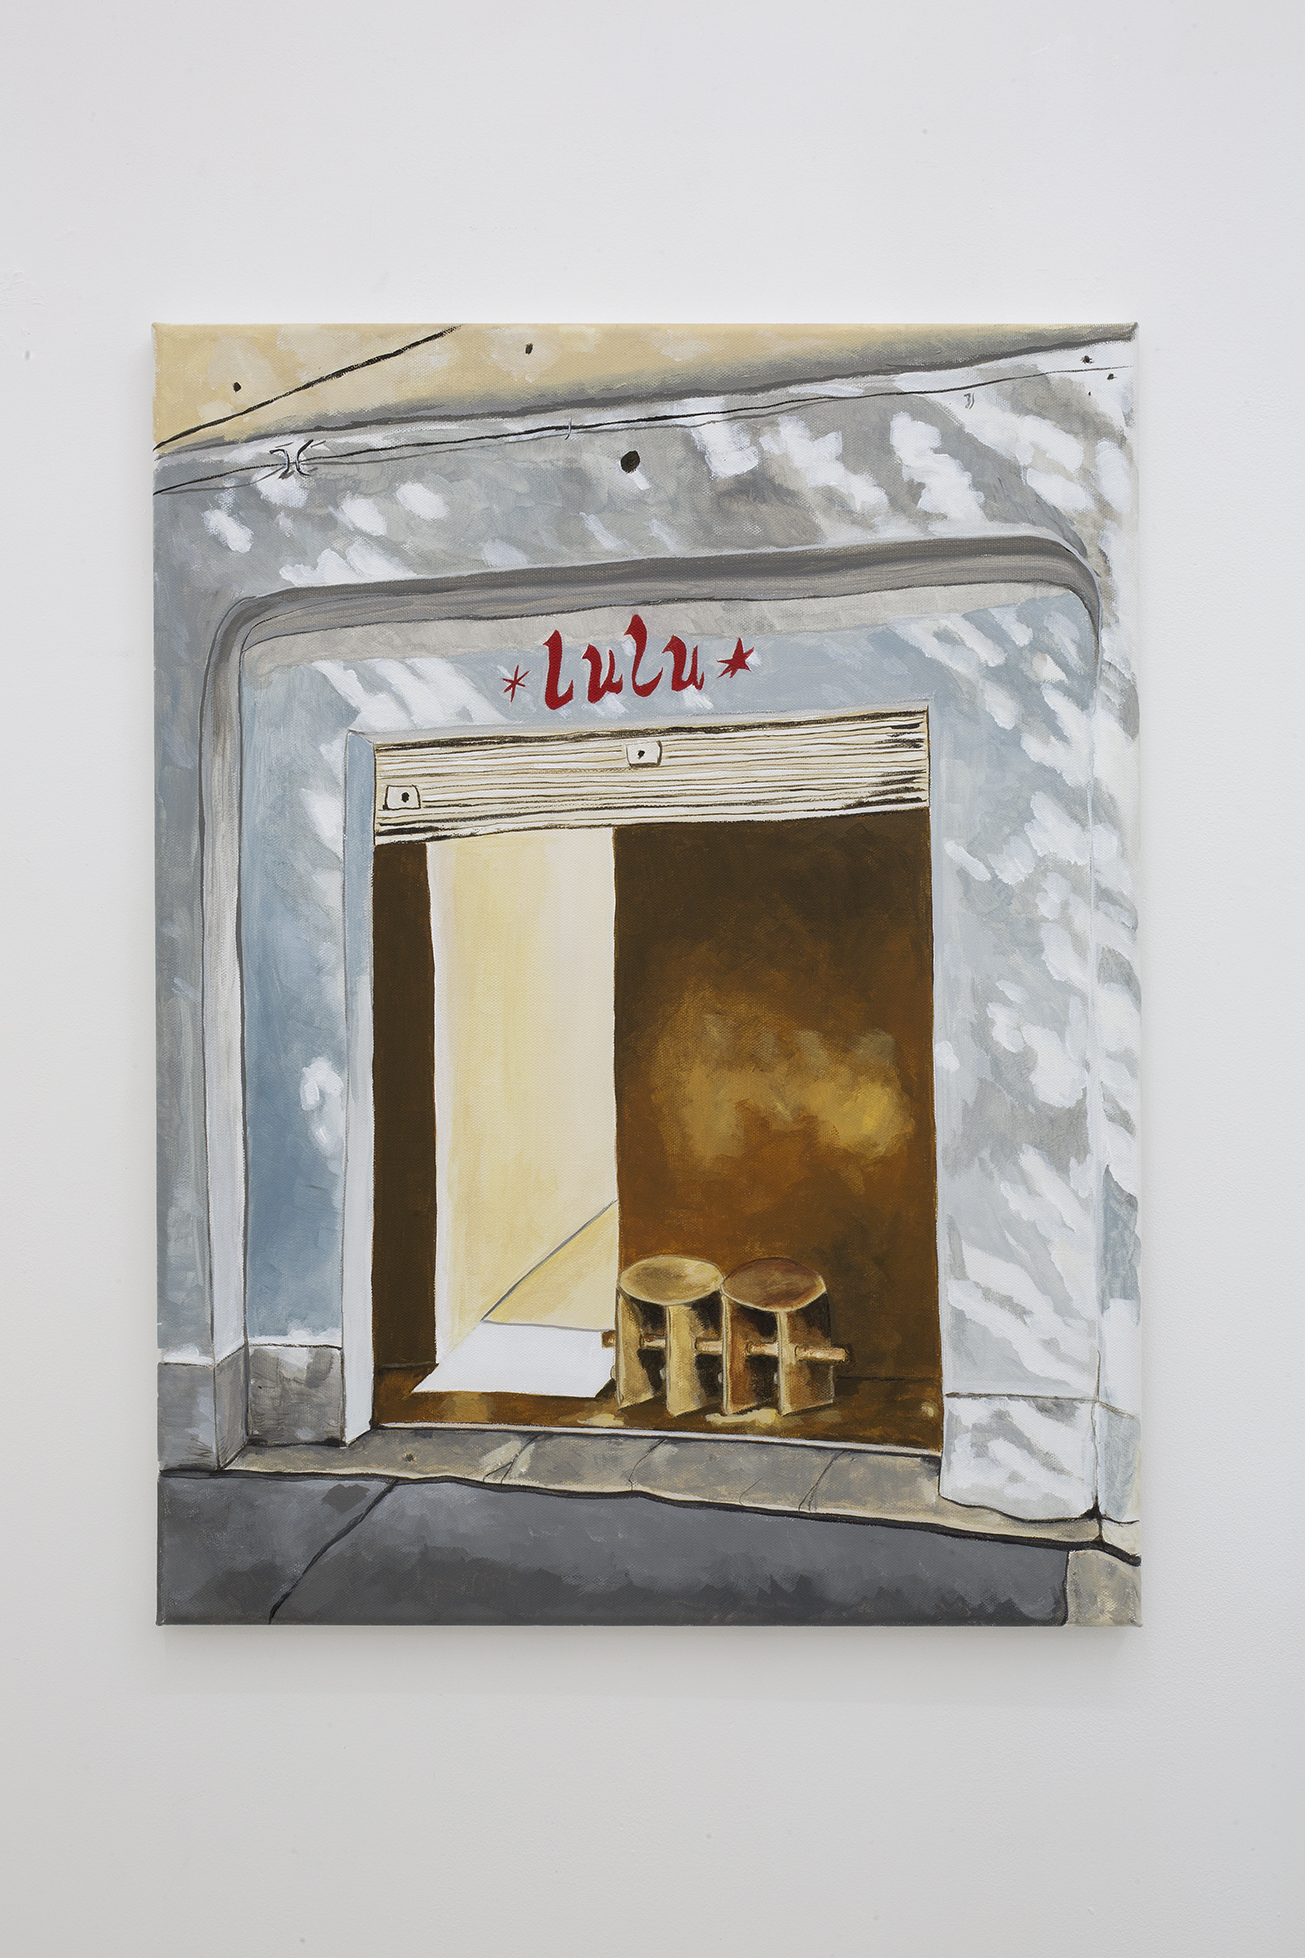 Shana Sharp, Lulu gallery, 2018. Acrylic on canvas. 18 x 24 inch (45.72 x 60.96 cm)